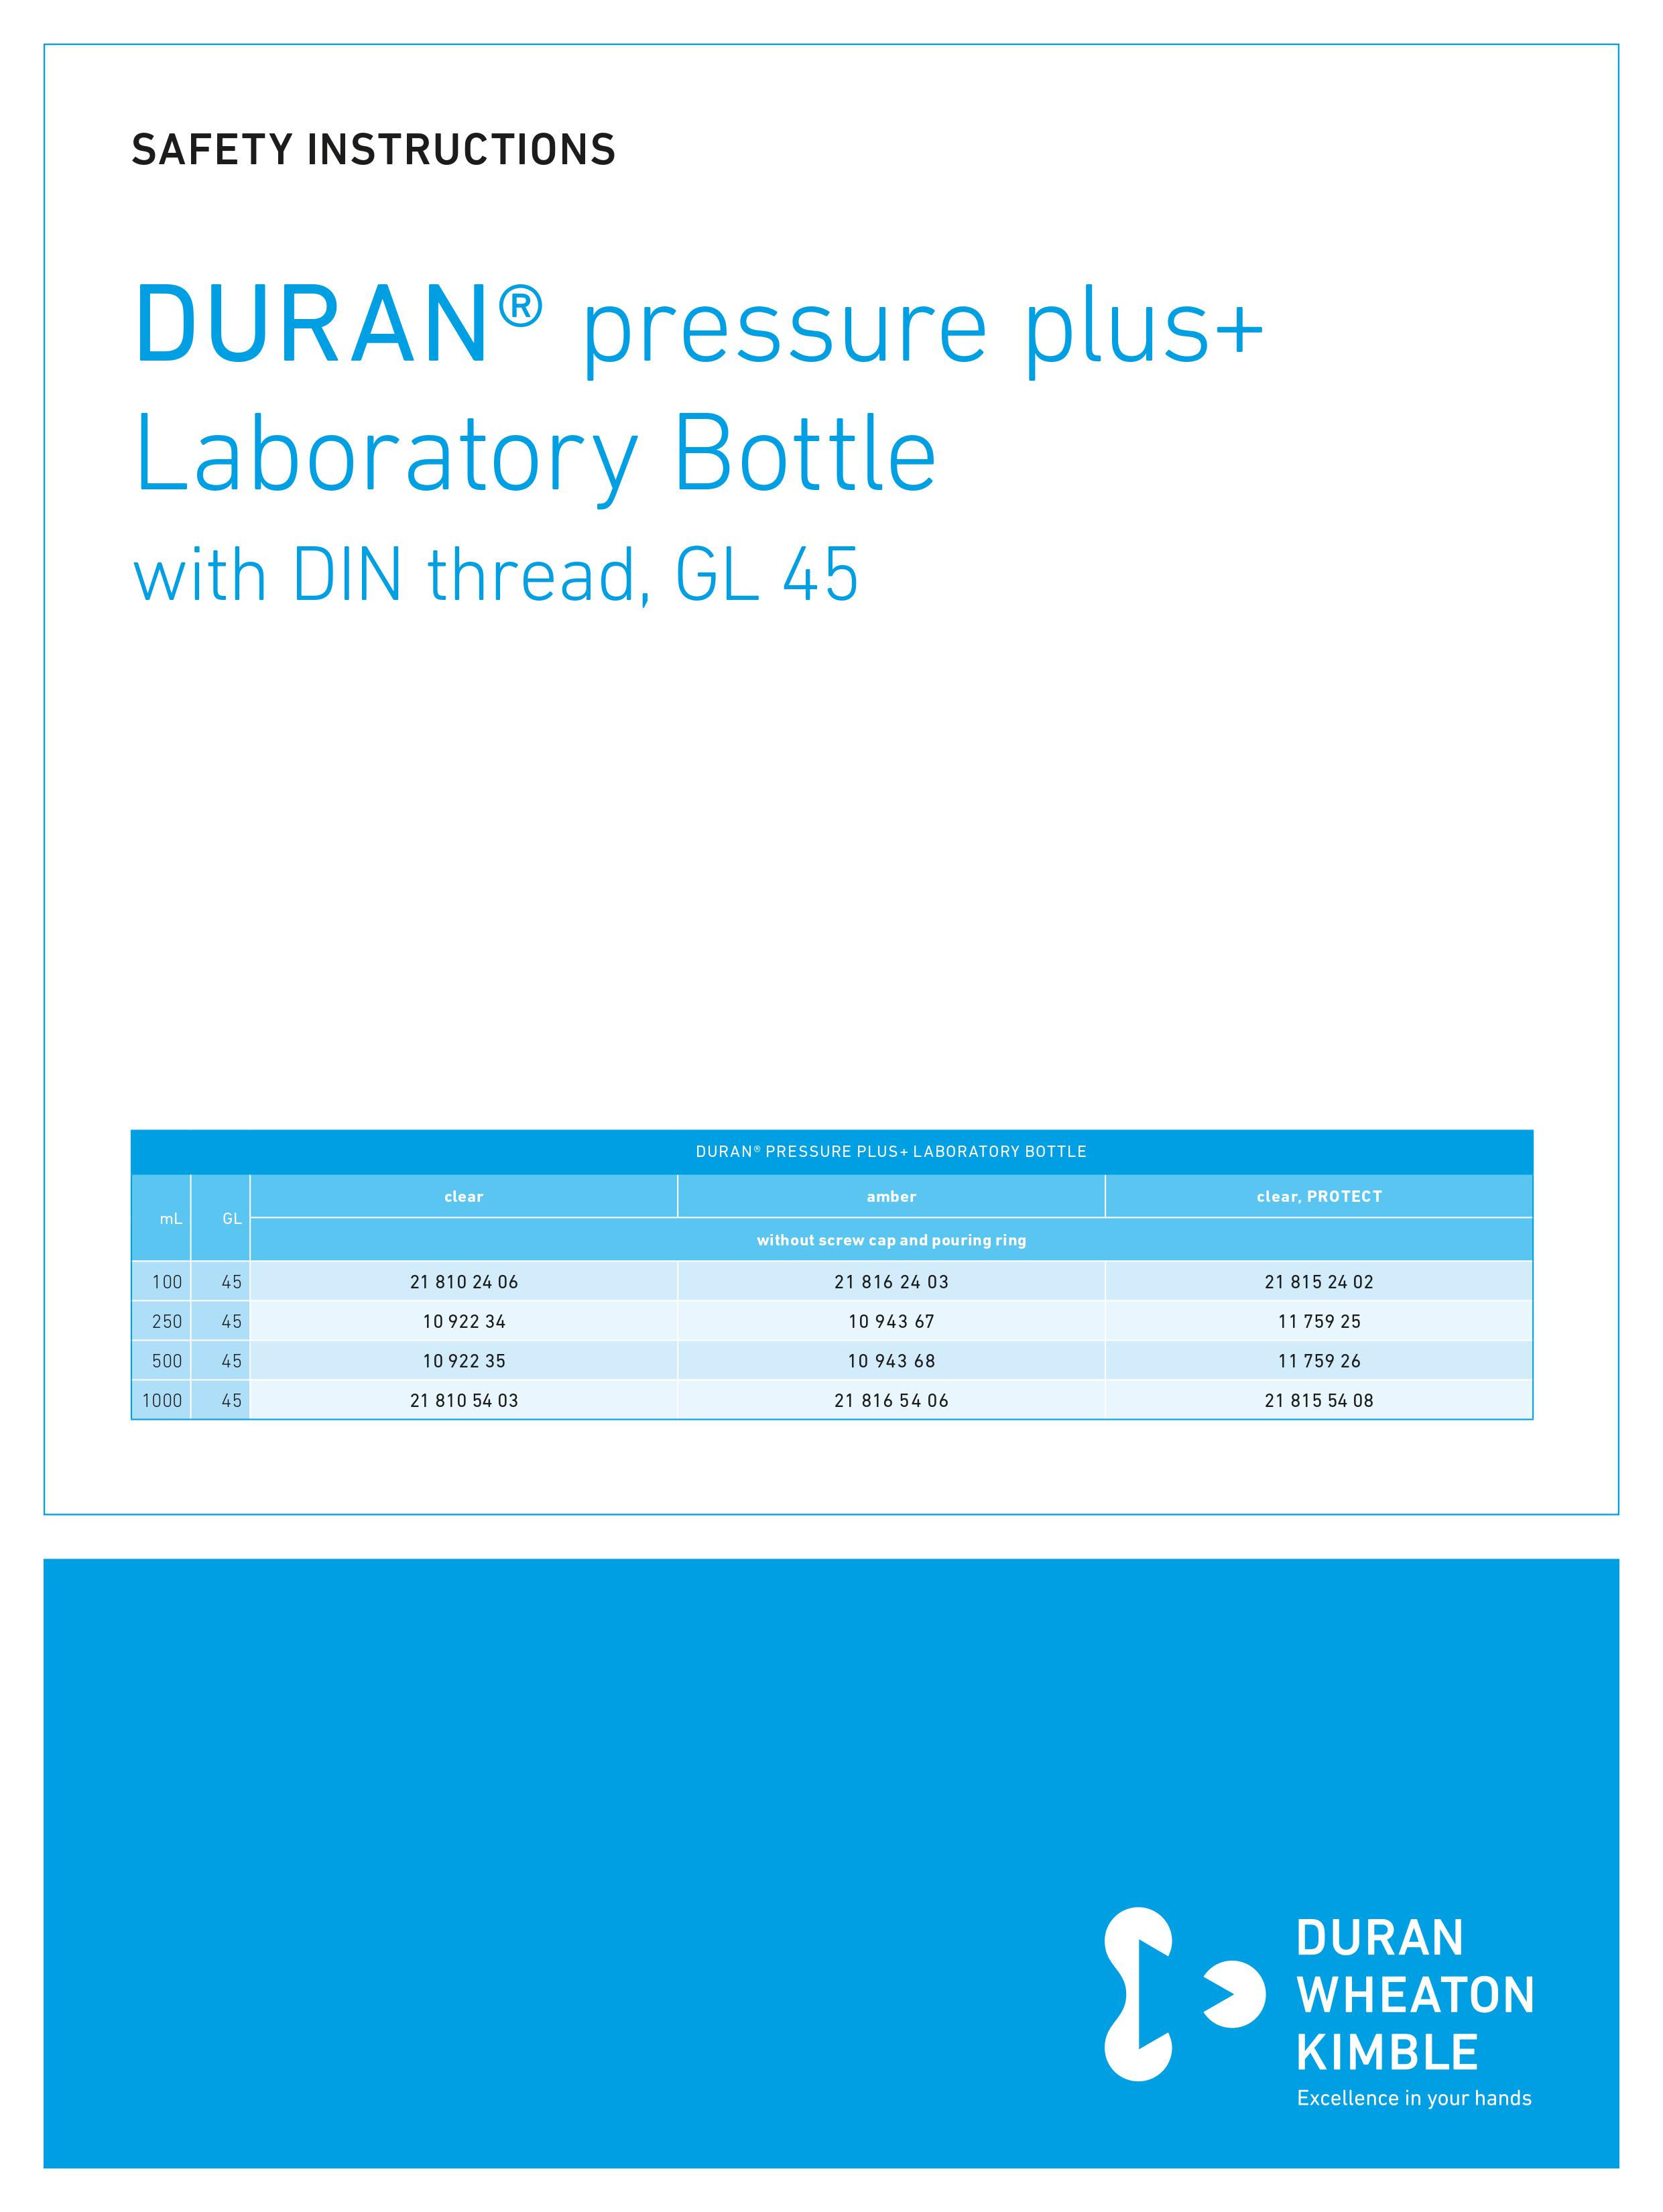 DWK SAFETY INSTRUCTIONS DURAN® pressure plus+ Bottle